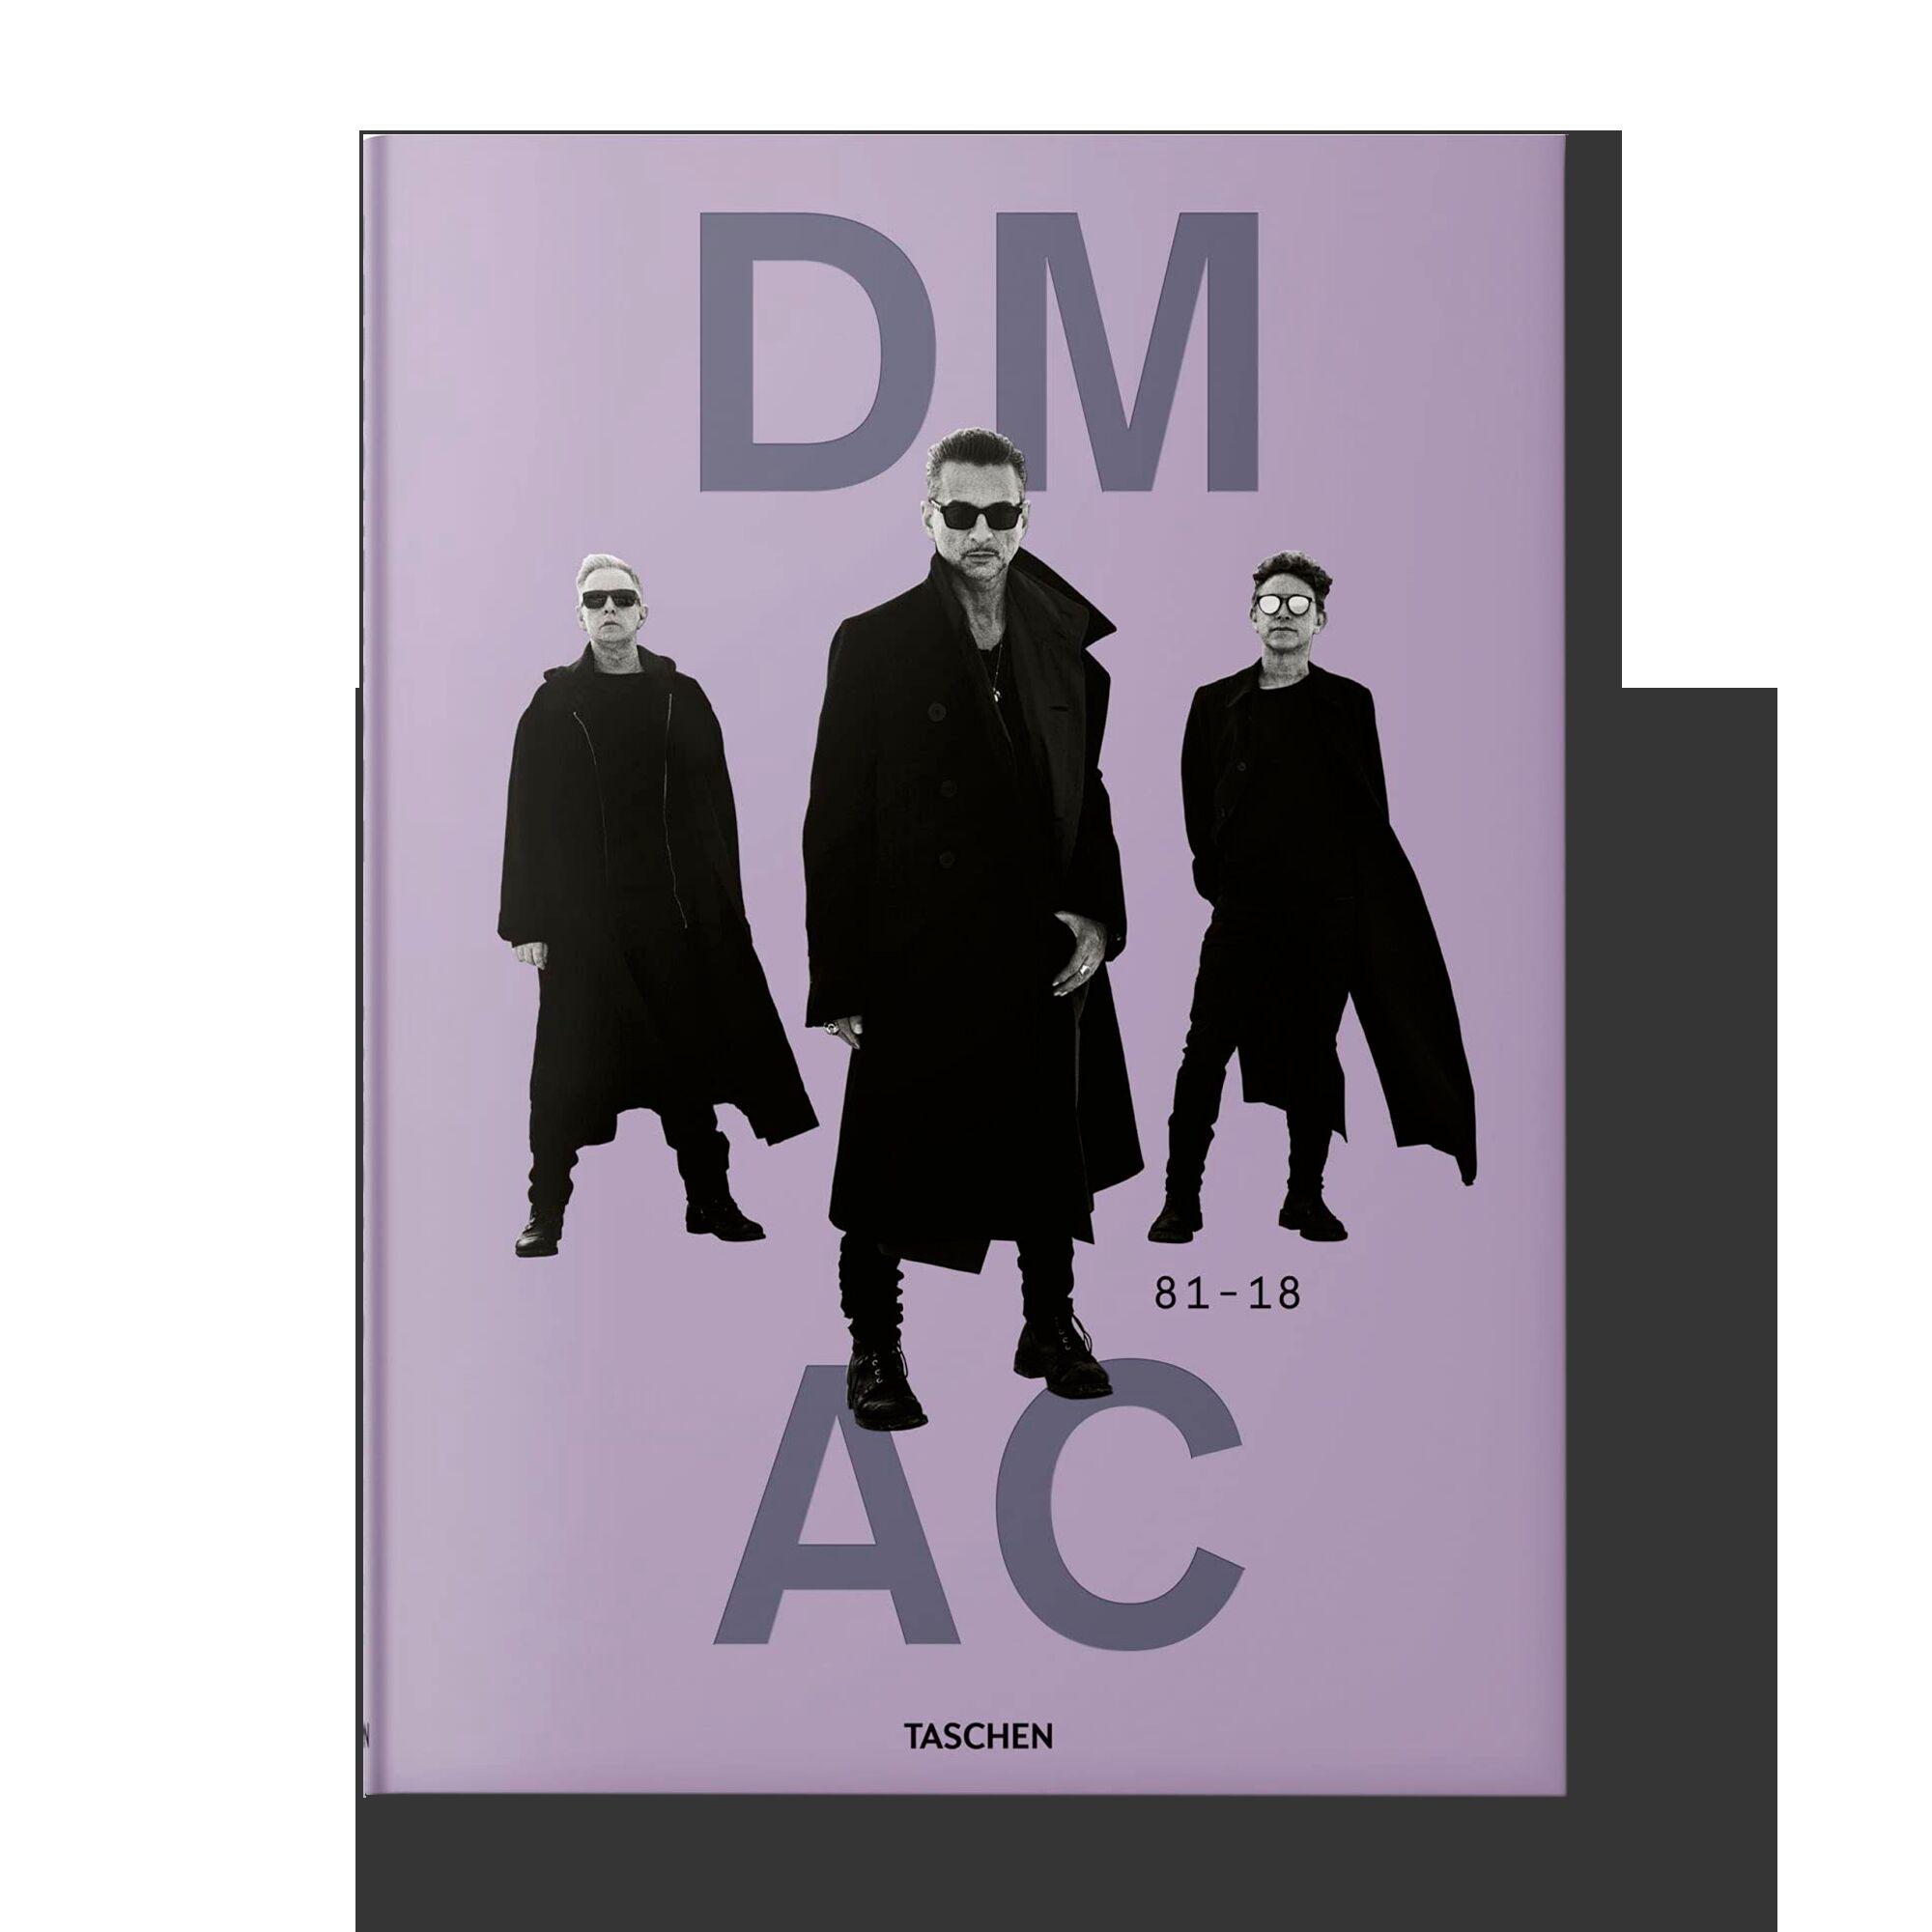 Depeche Mode by Anton Corbijn